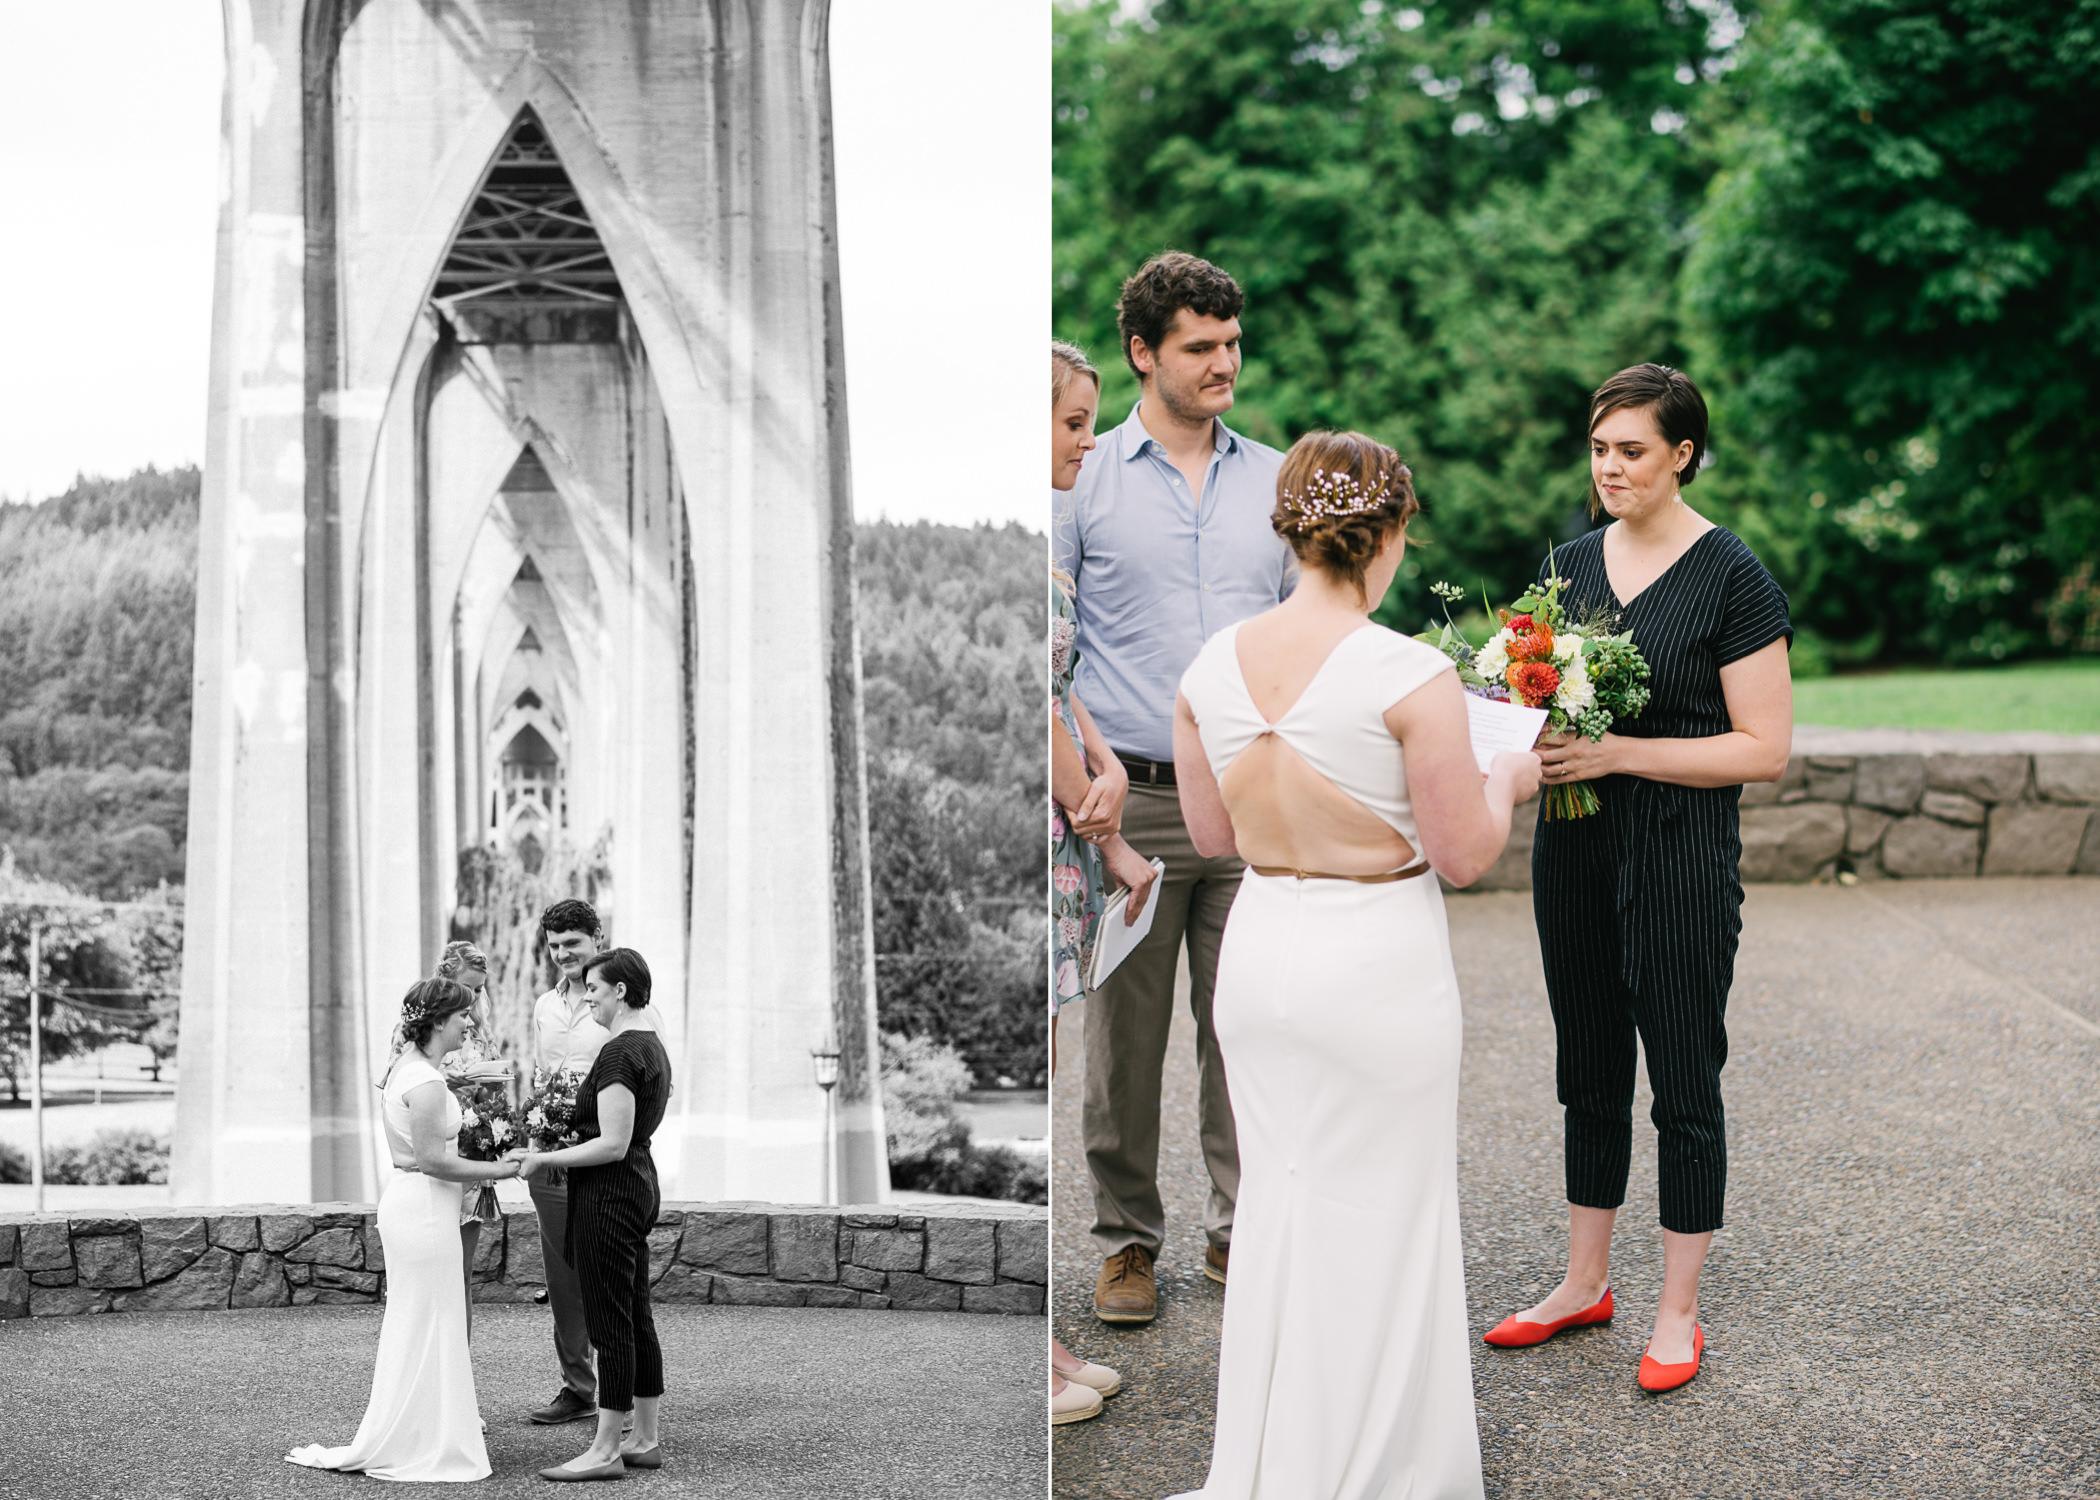 cathedral-park-portland-elopement-gay-wedding-021.JPG